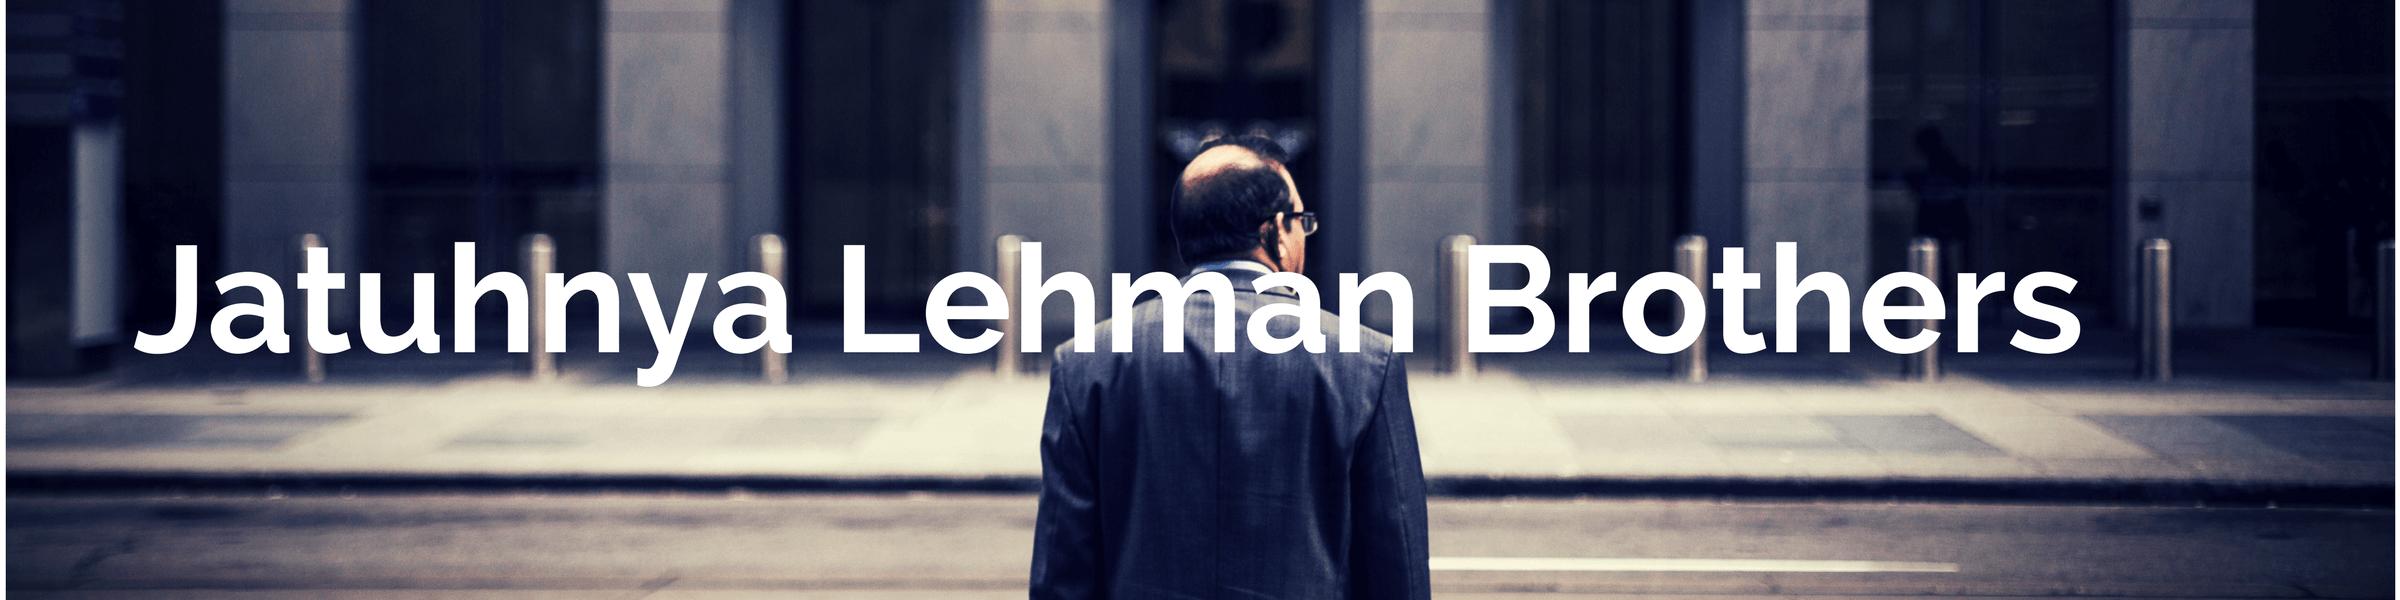 Jatuhnya Lehman Brothers